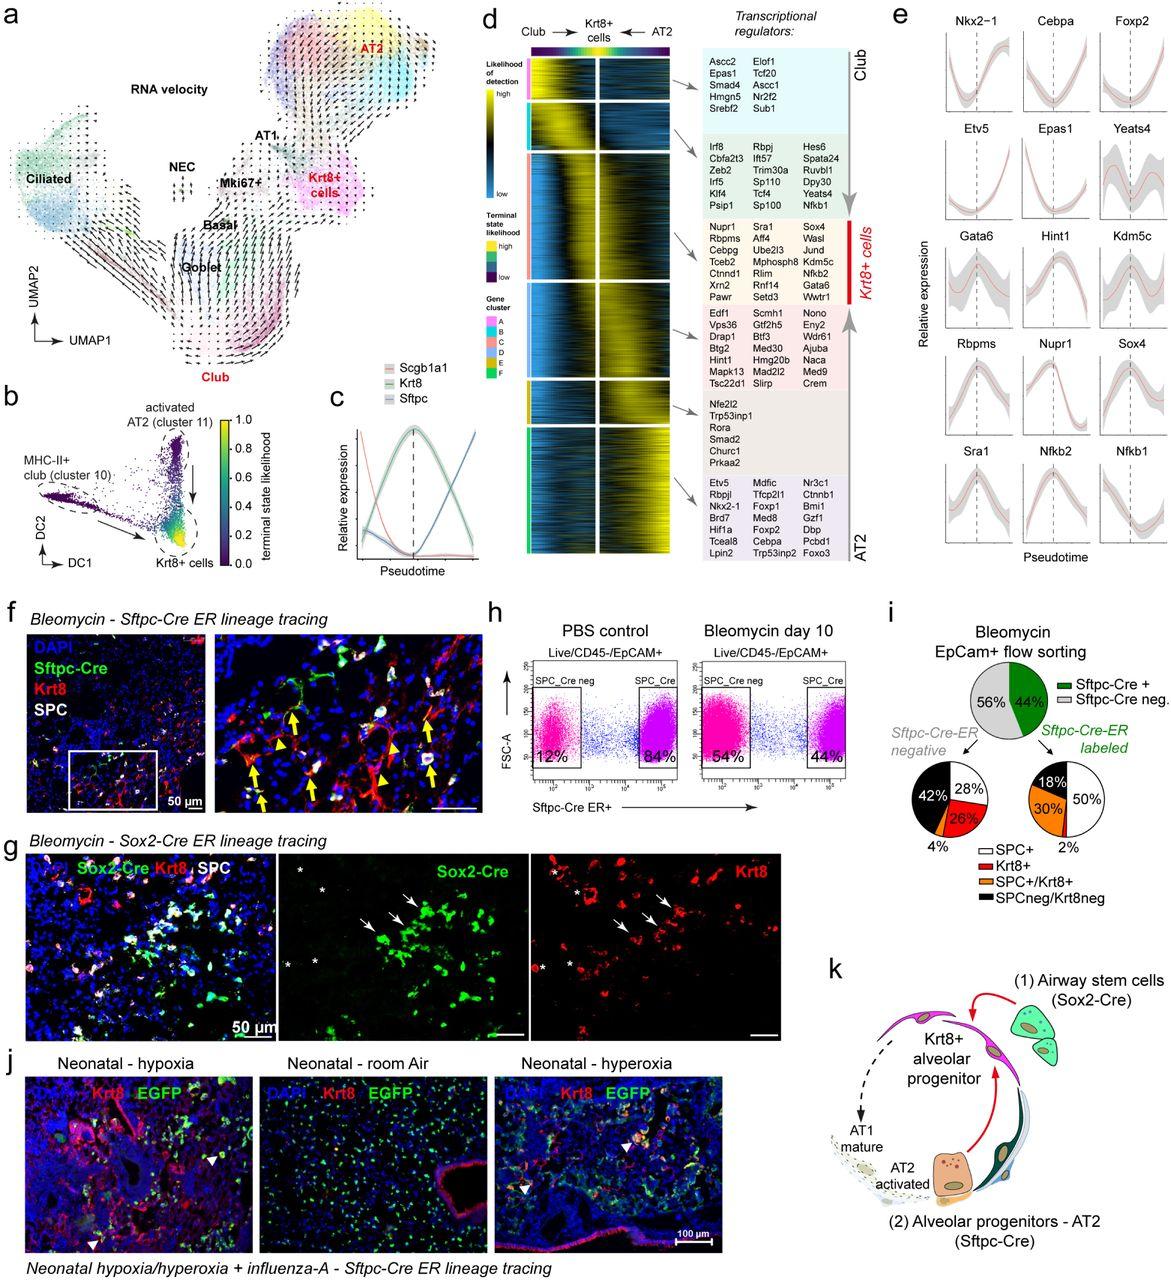 Longitudinal single cell transcriptomics reveals Krt8+